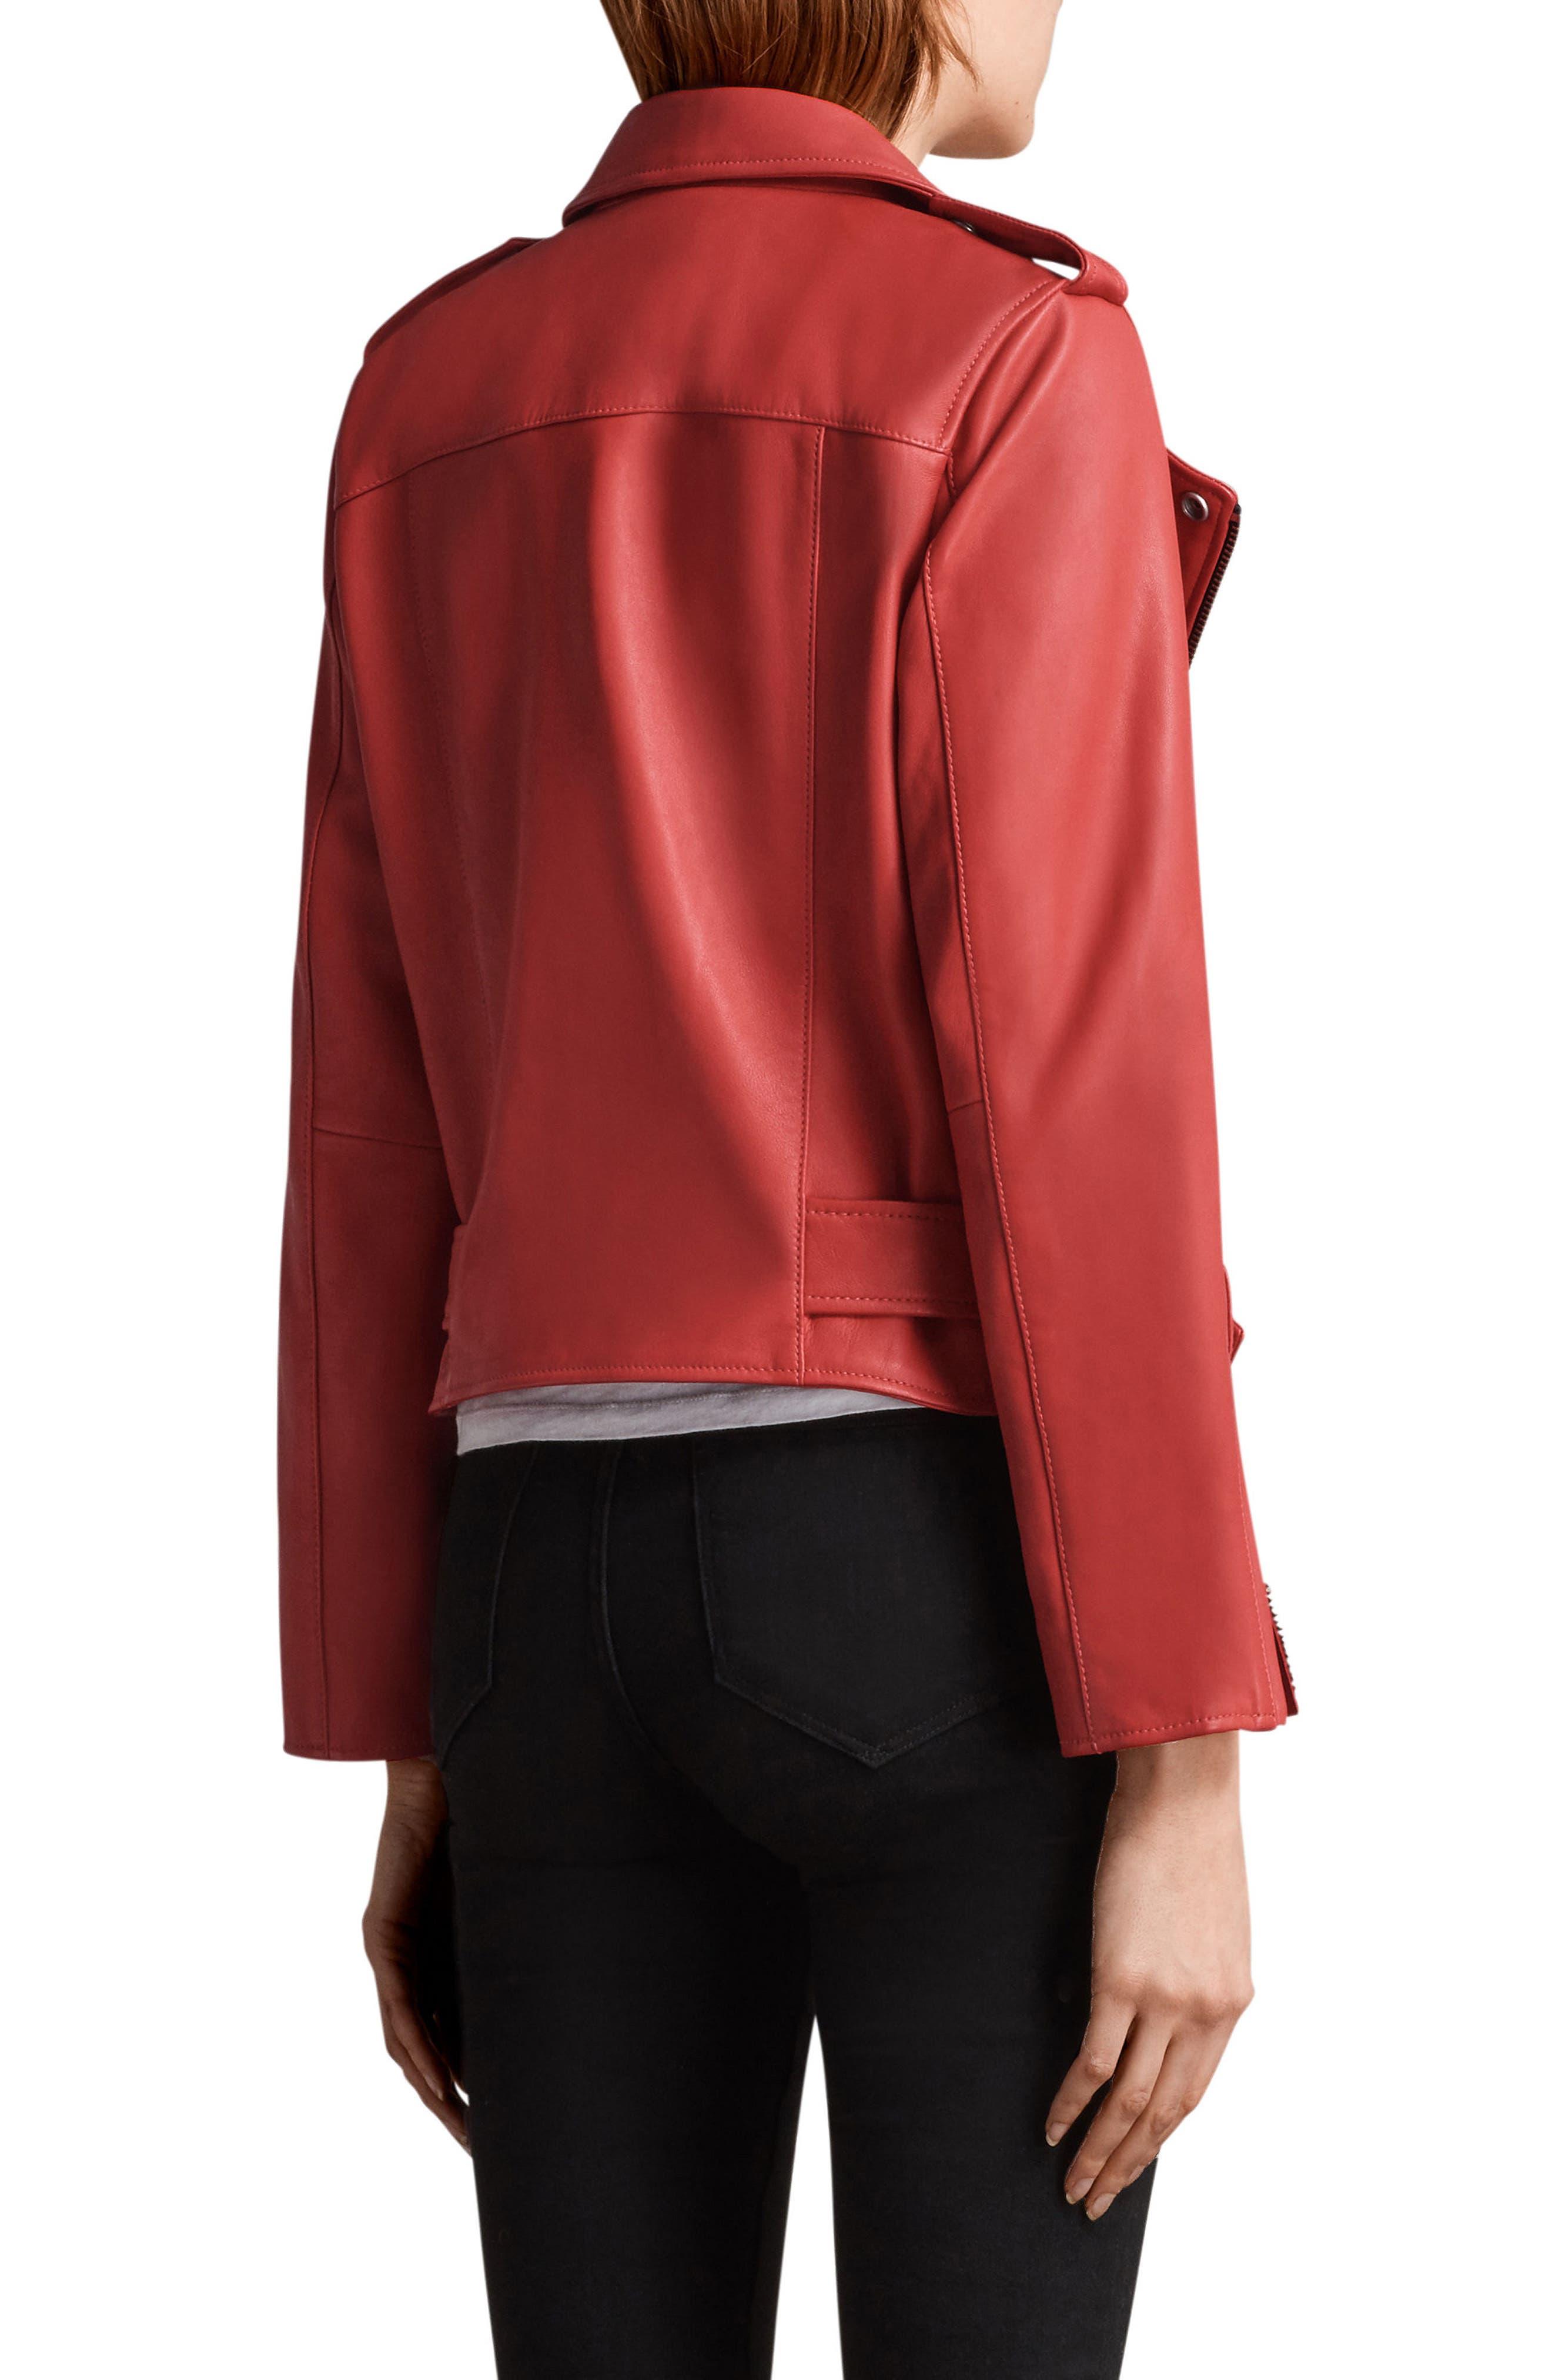 Balfern Leather Biker Jacket,                             Alternate thumbnail 3, color,                             Coral Red